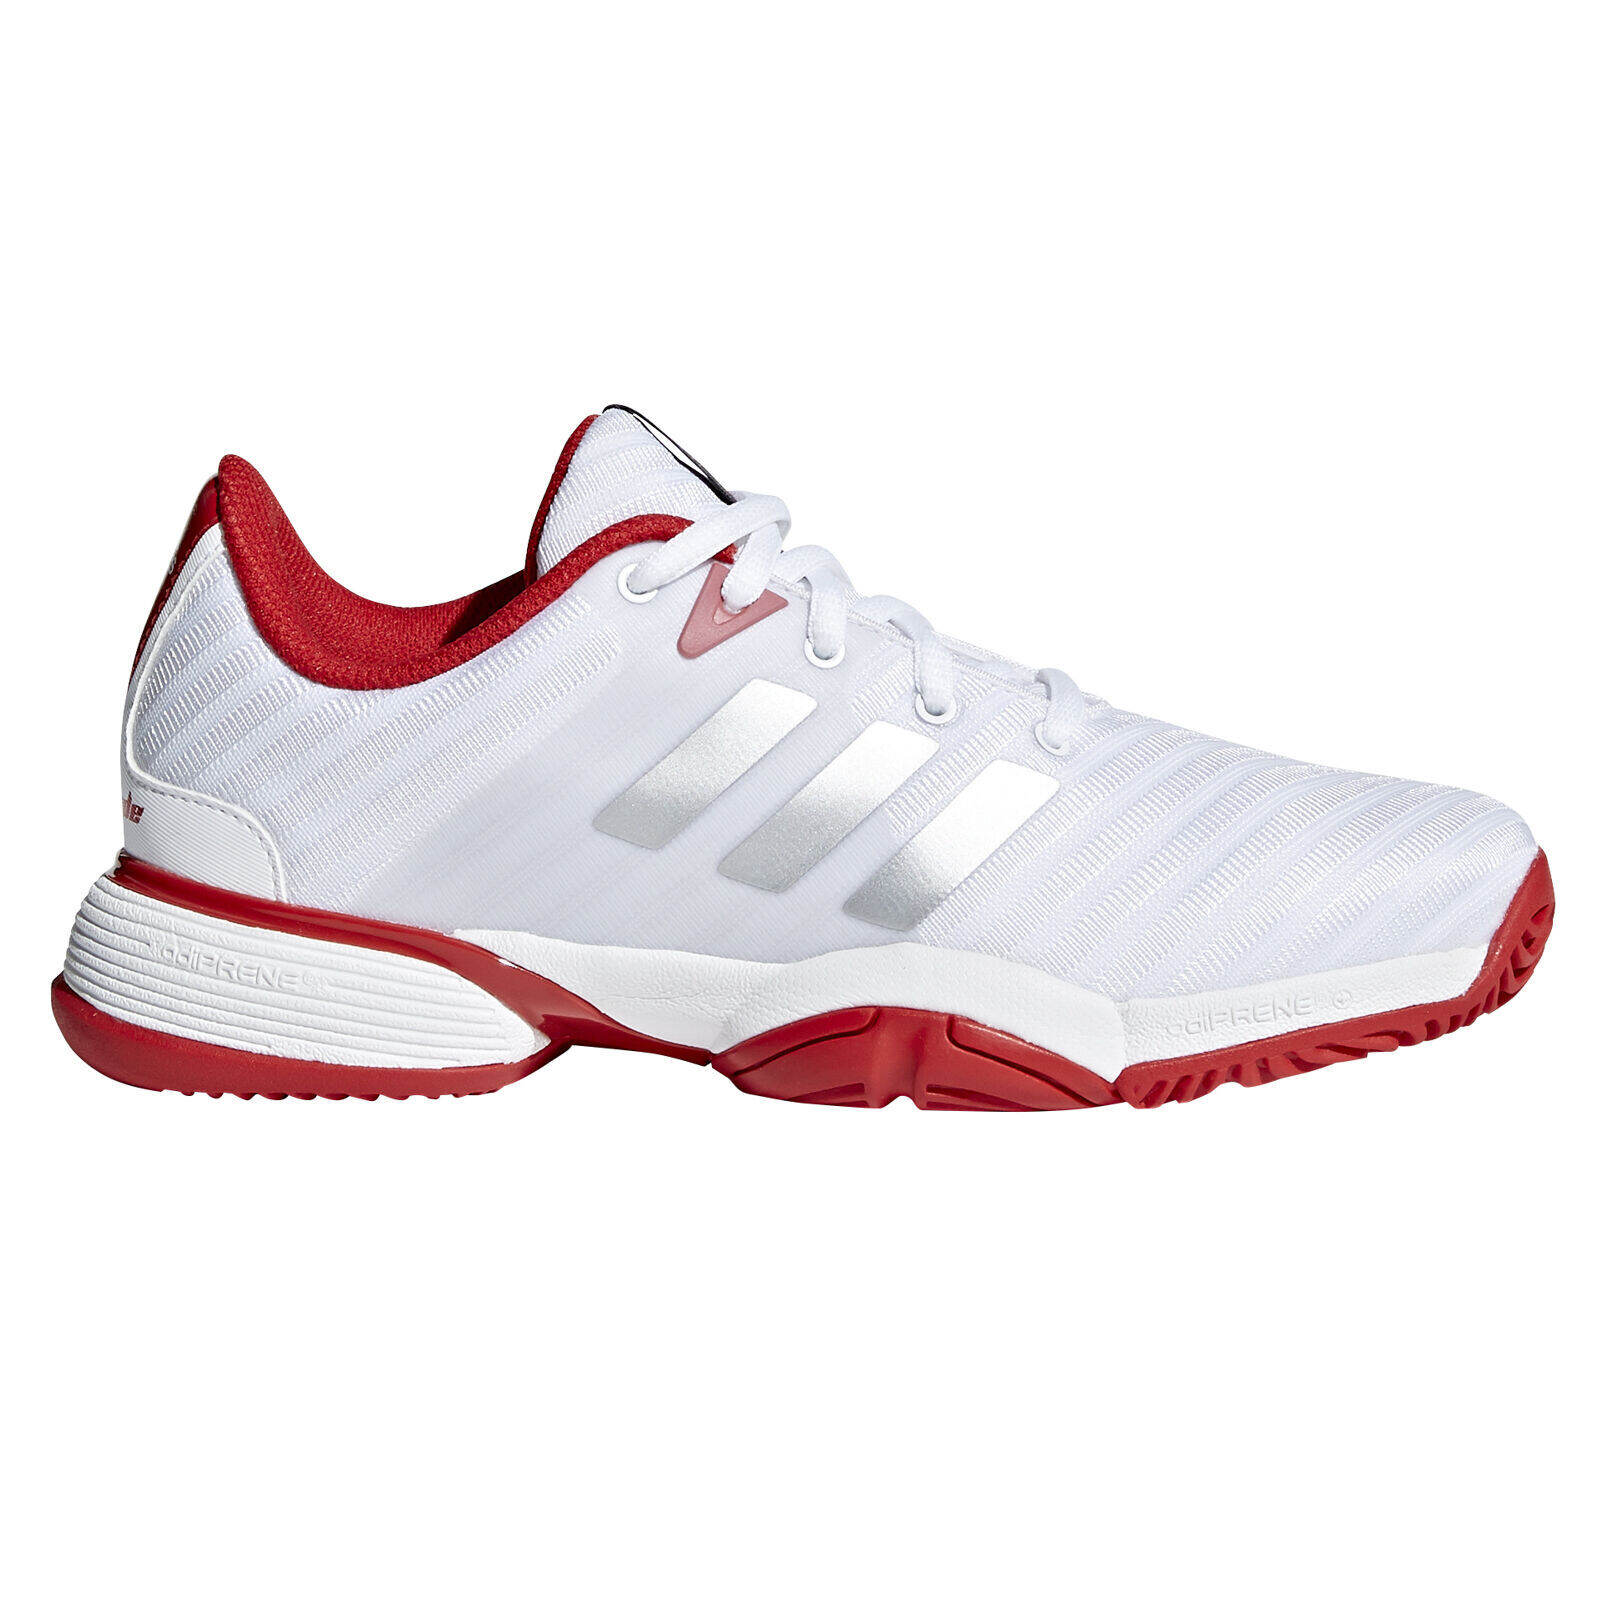 adidas Barricade xJ Junior's Tennis Shoe - White/Red